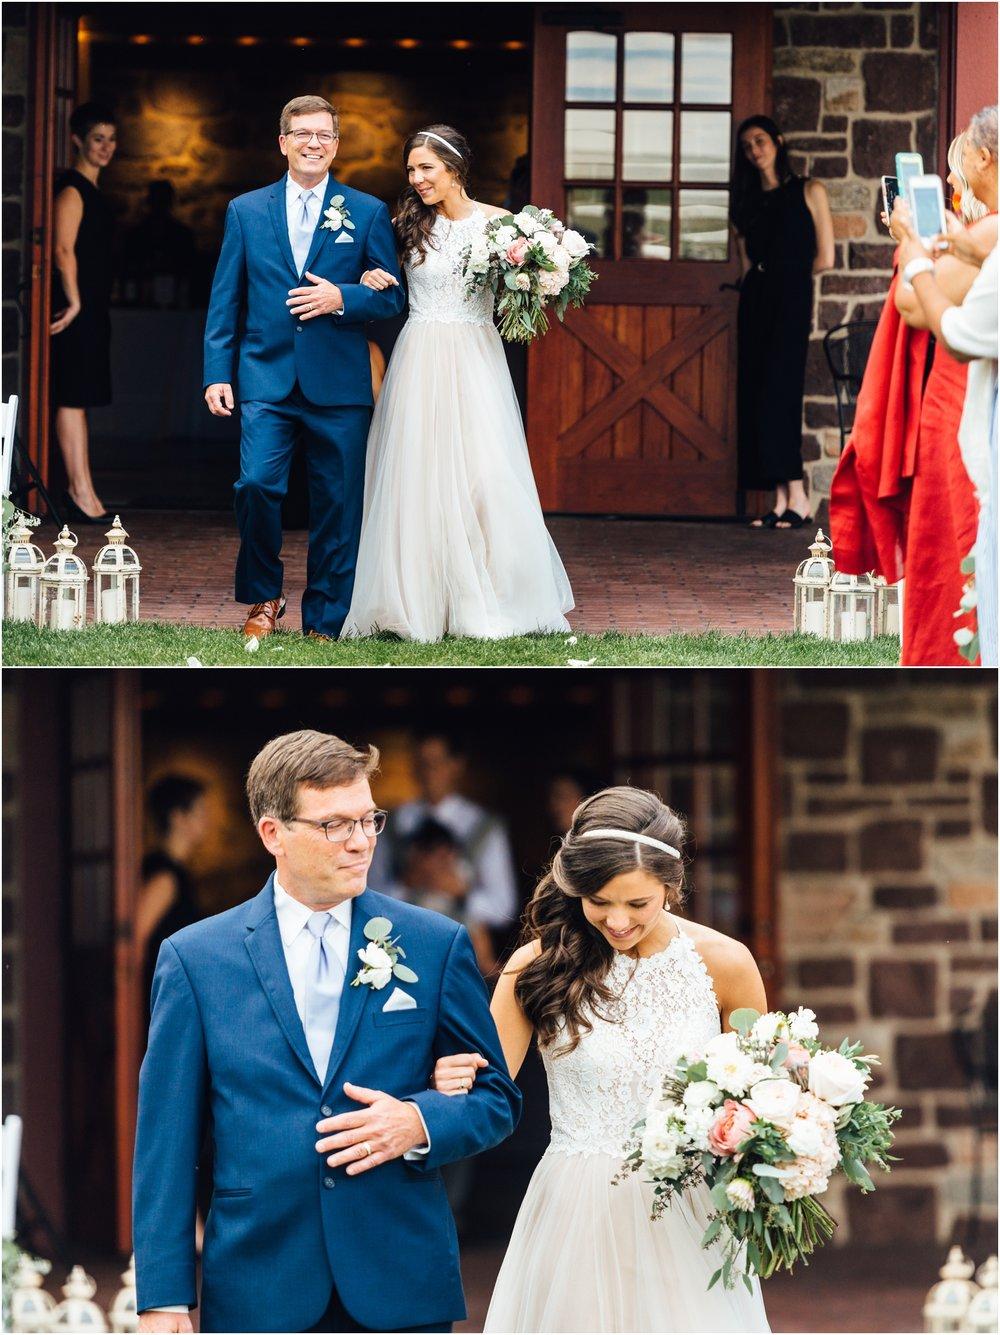 Steph&Bryan_Lancaster_wedding_farm_0515.jpg